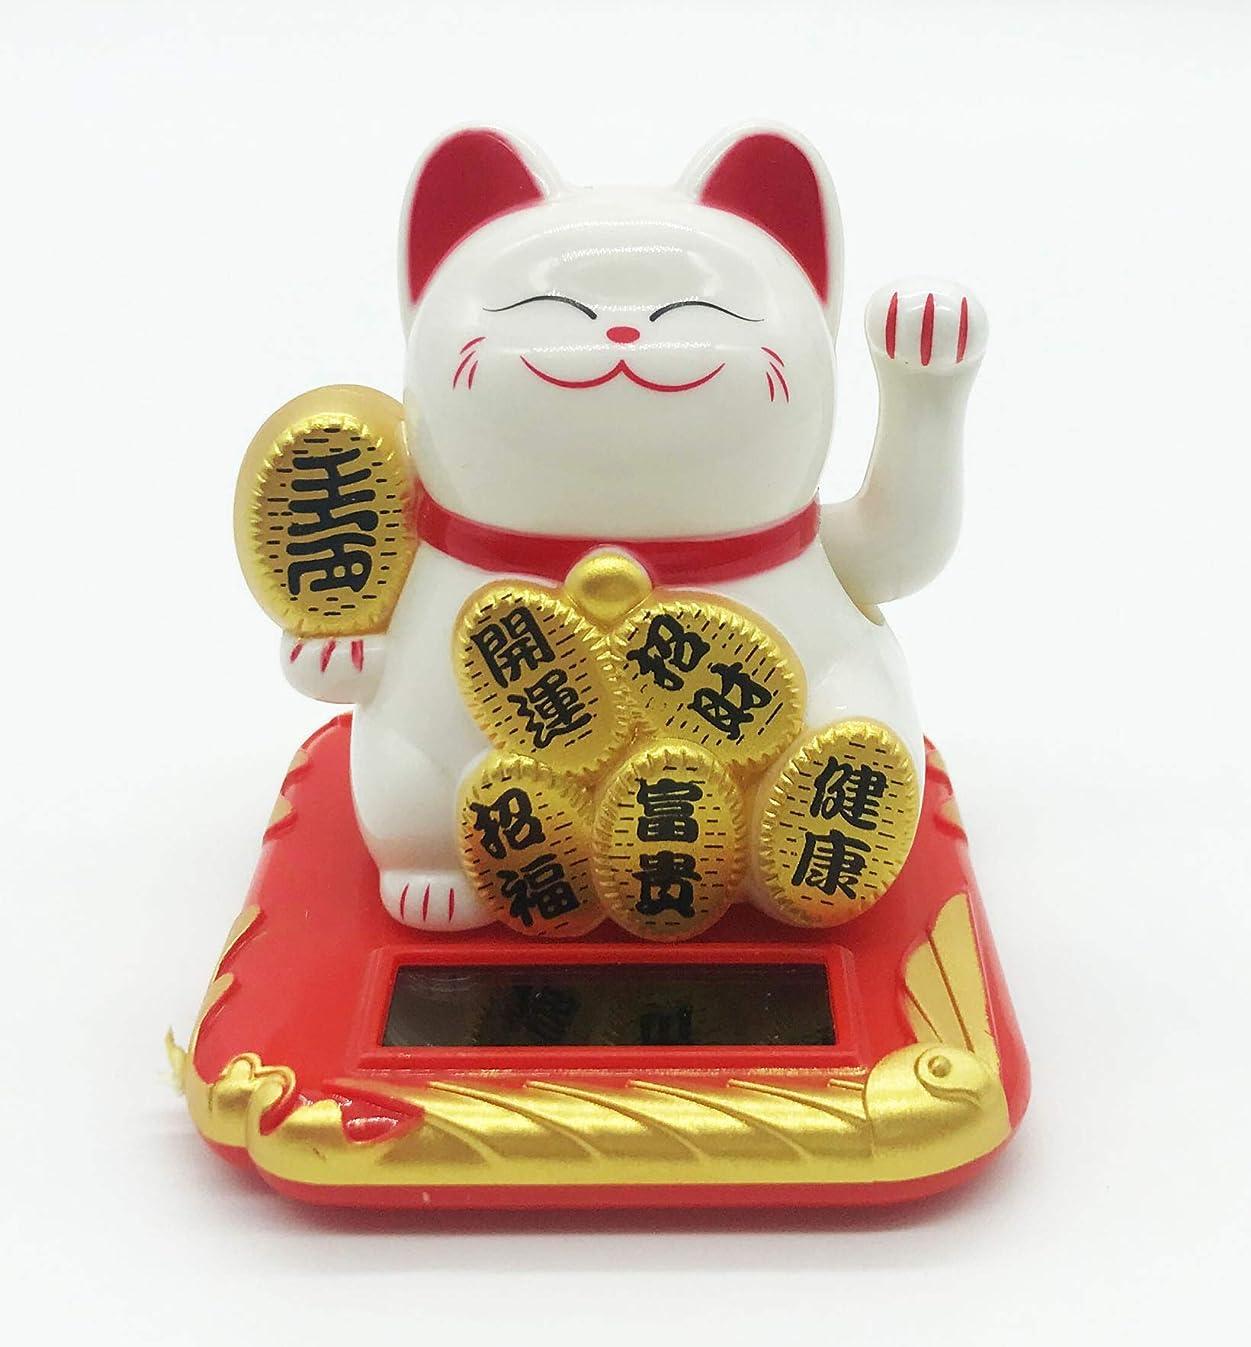 Cafolo Solar Powered Lucky Beckoning Waving Cat White Maneki Neko Lucky Money Cat for Home Office and Car décor (White)